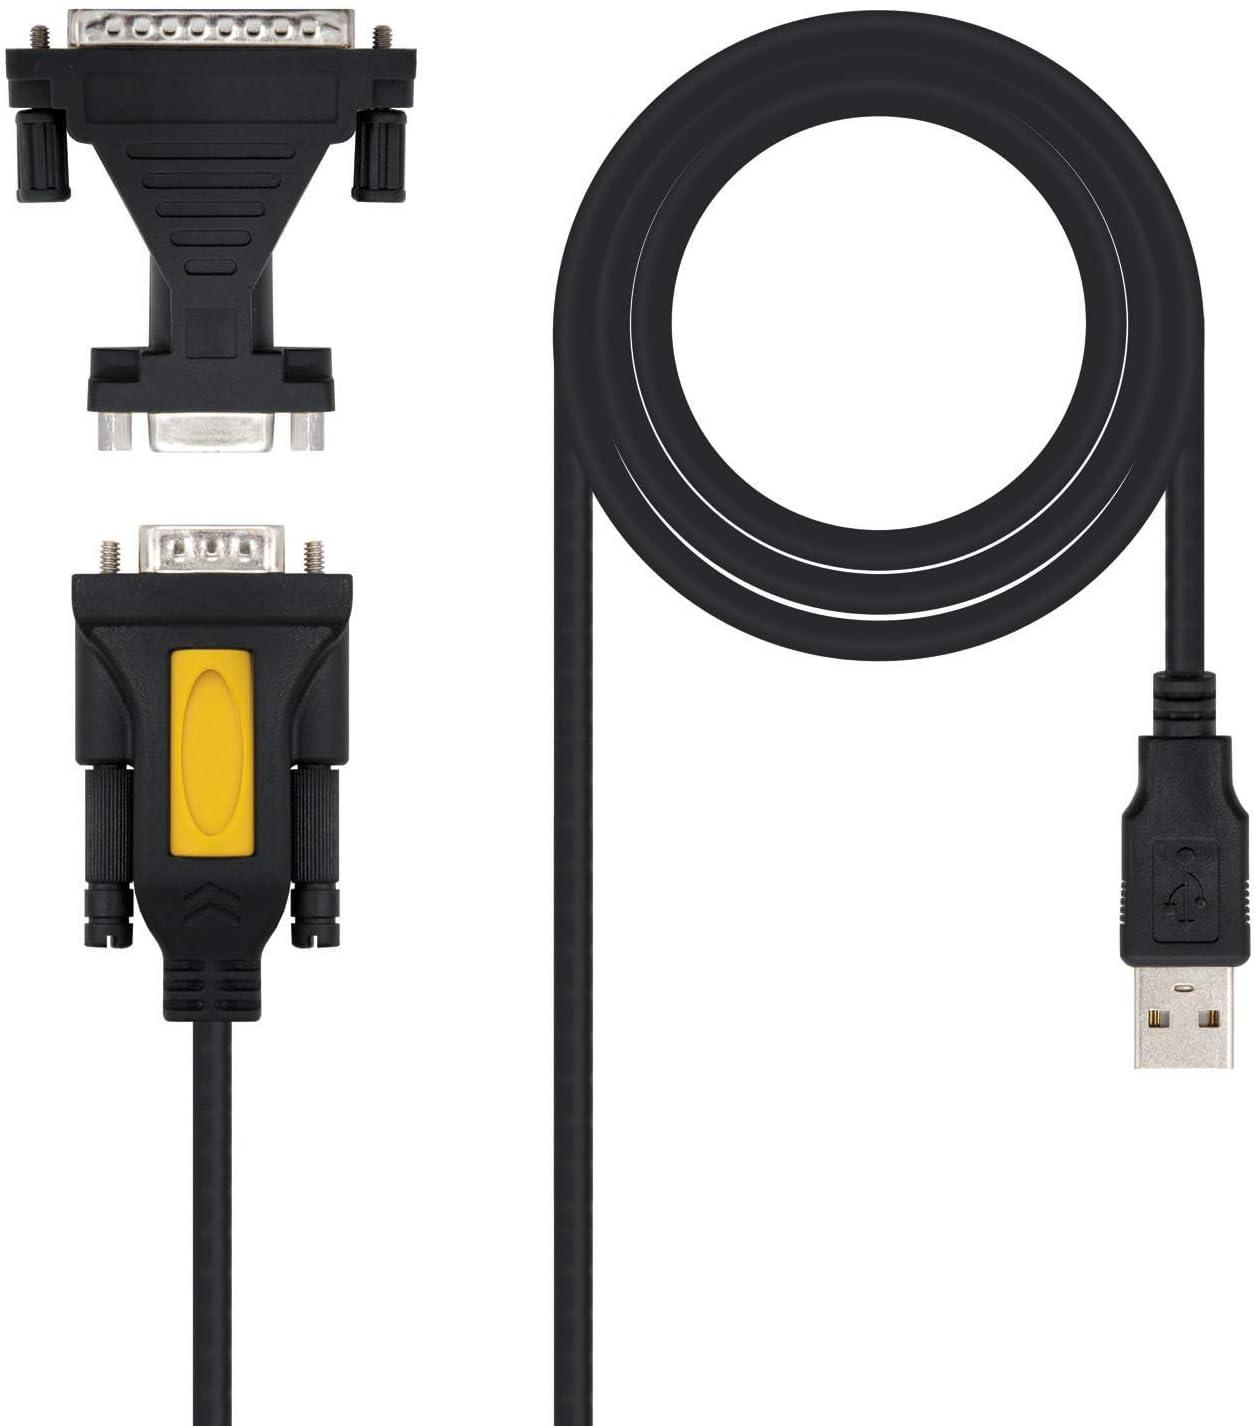 NANOCABLE Acer 10.03.0002 - Conversor USB a Serie para Impresora, Tipo A/M-RS232 DB9/M DB25/M, Macho-Macho, Negro, 1.8mts